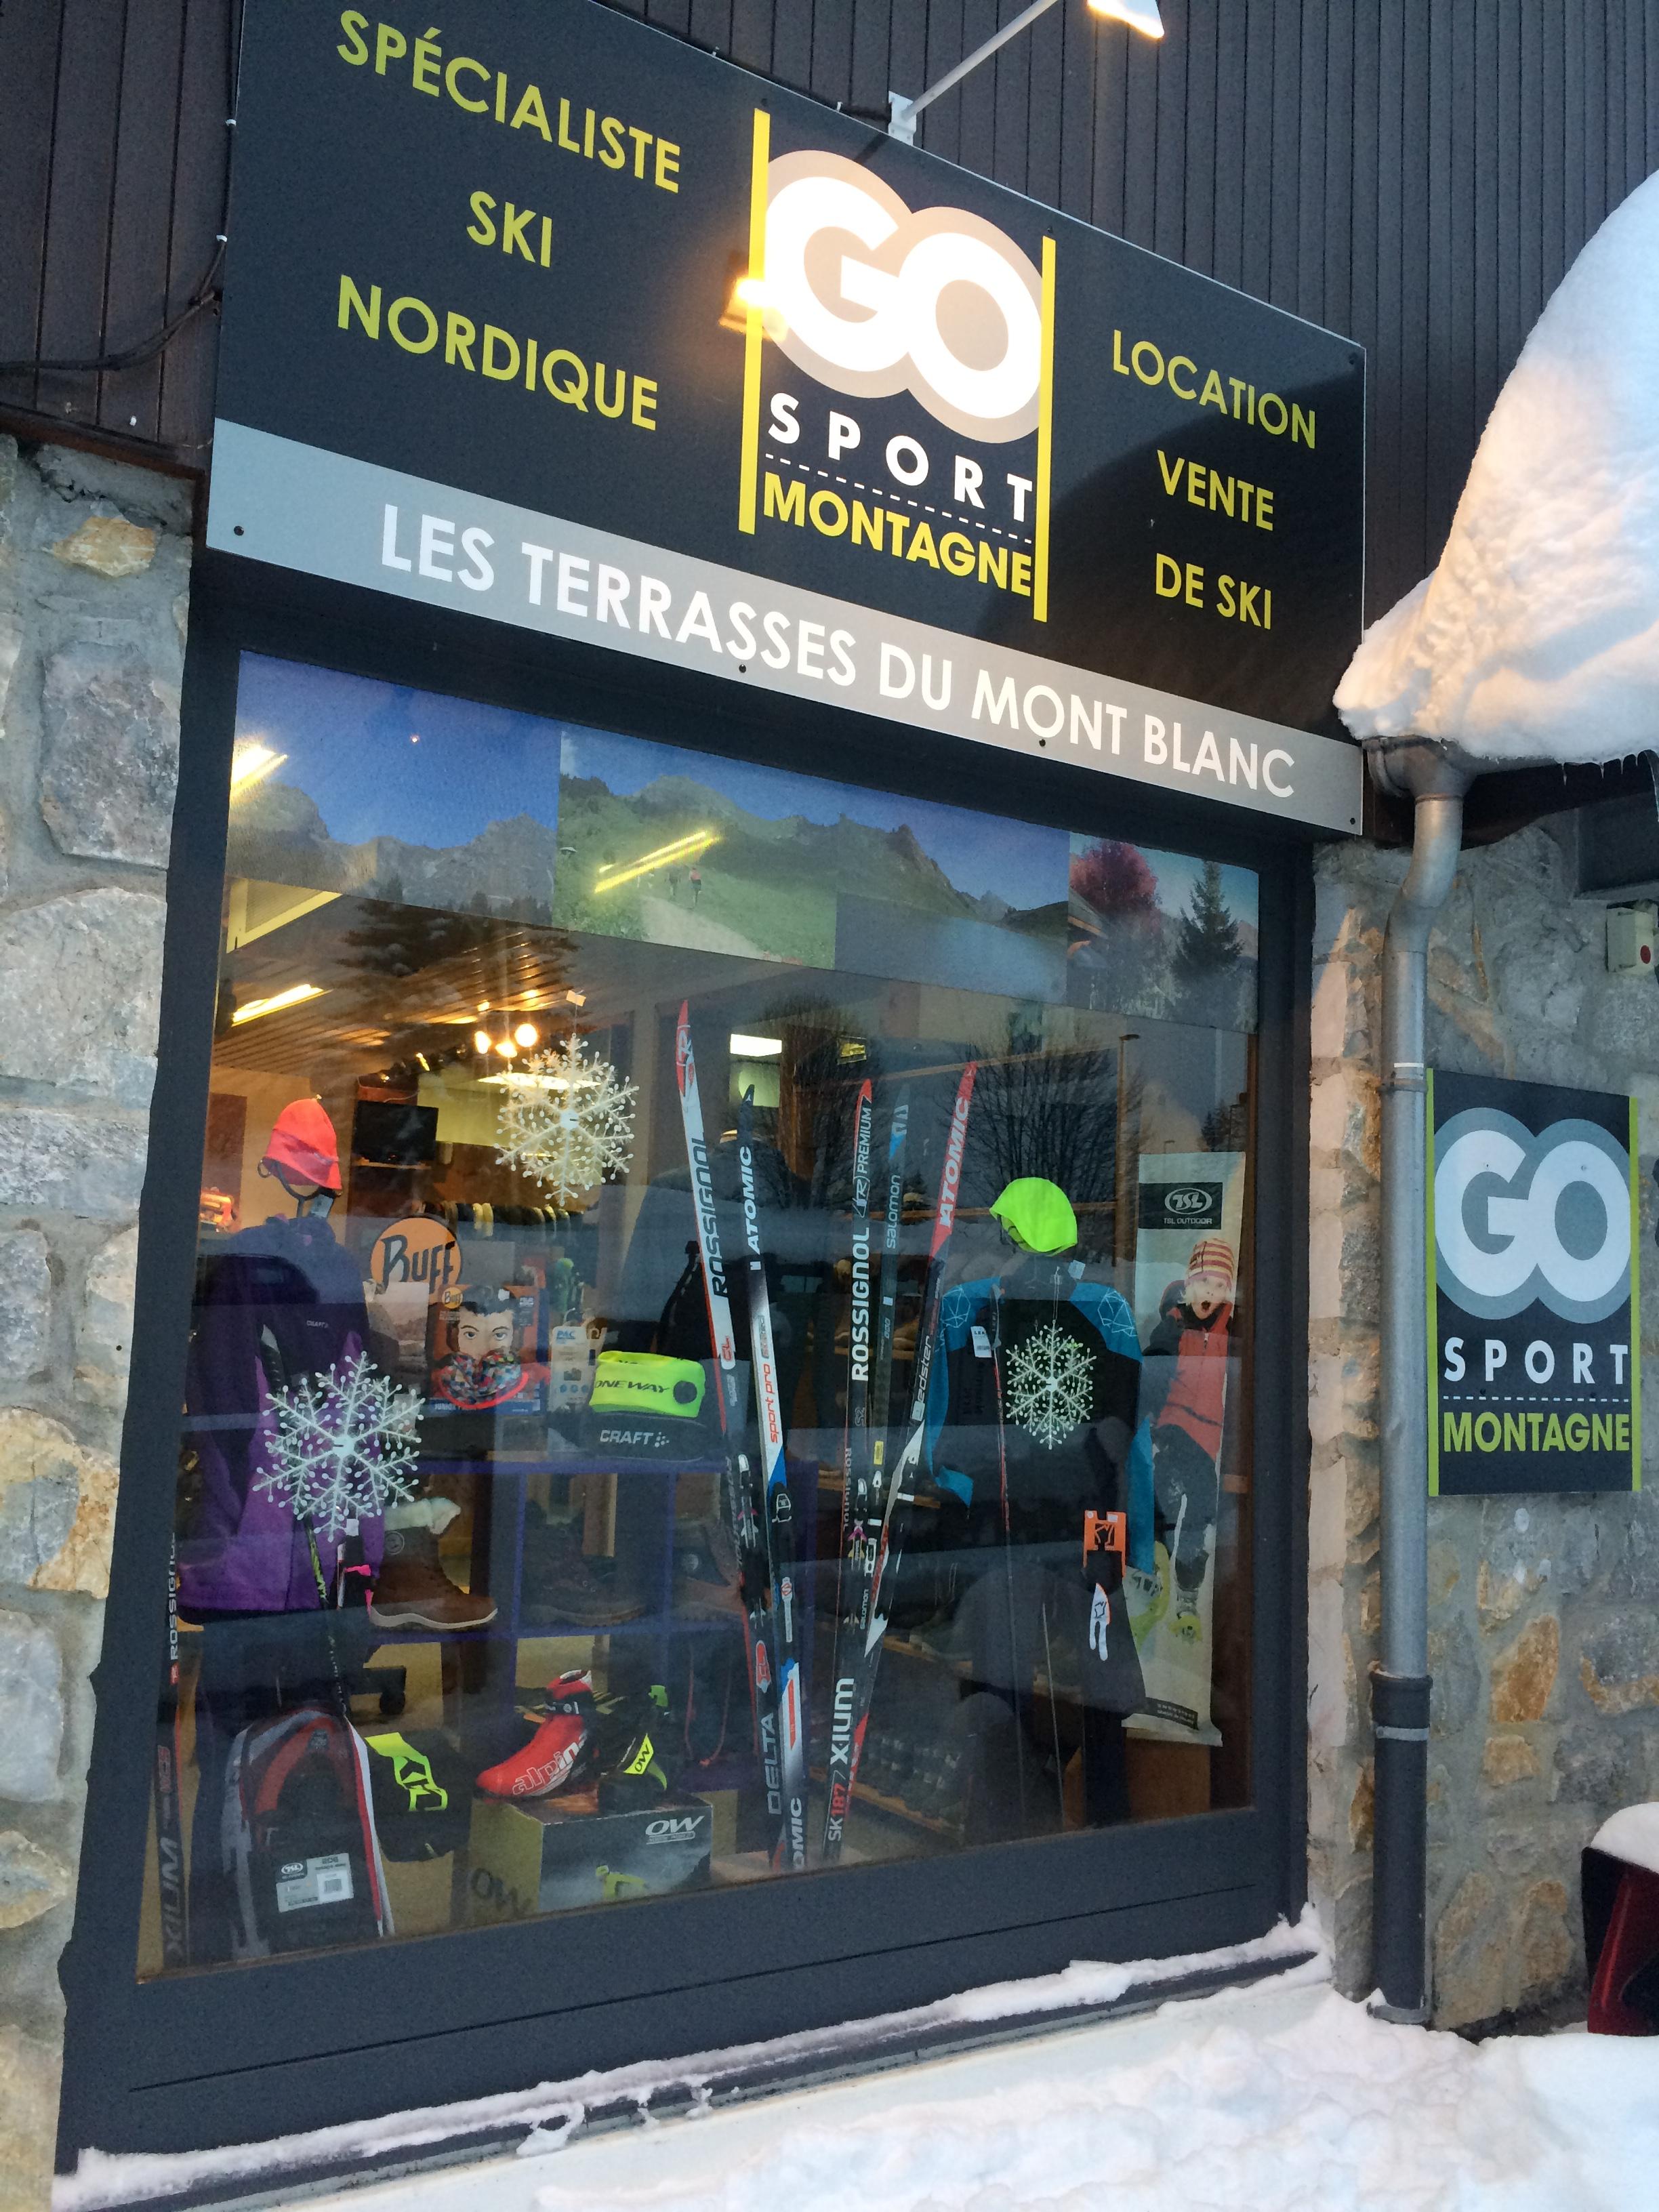 Go Sport Terrasses du Mont Blanc (2)